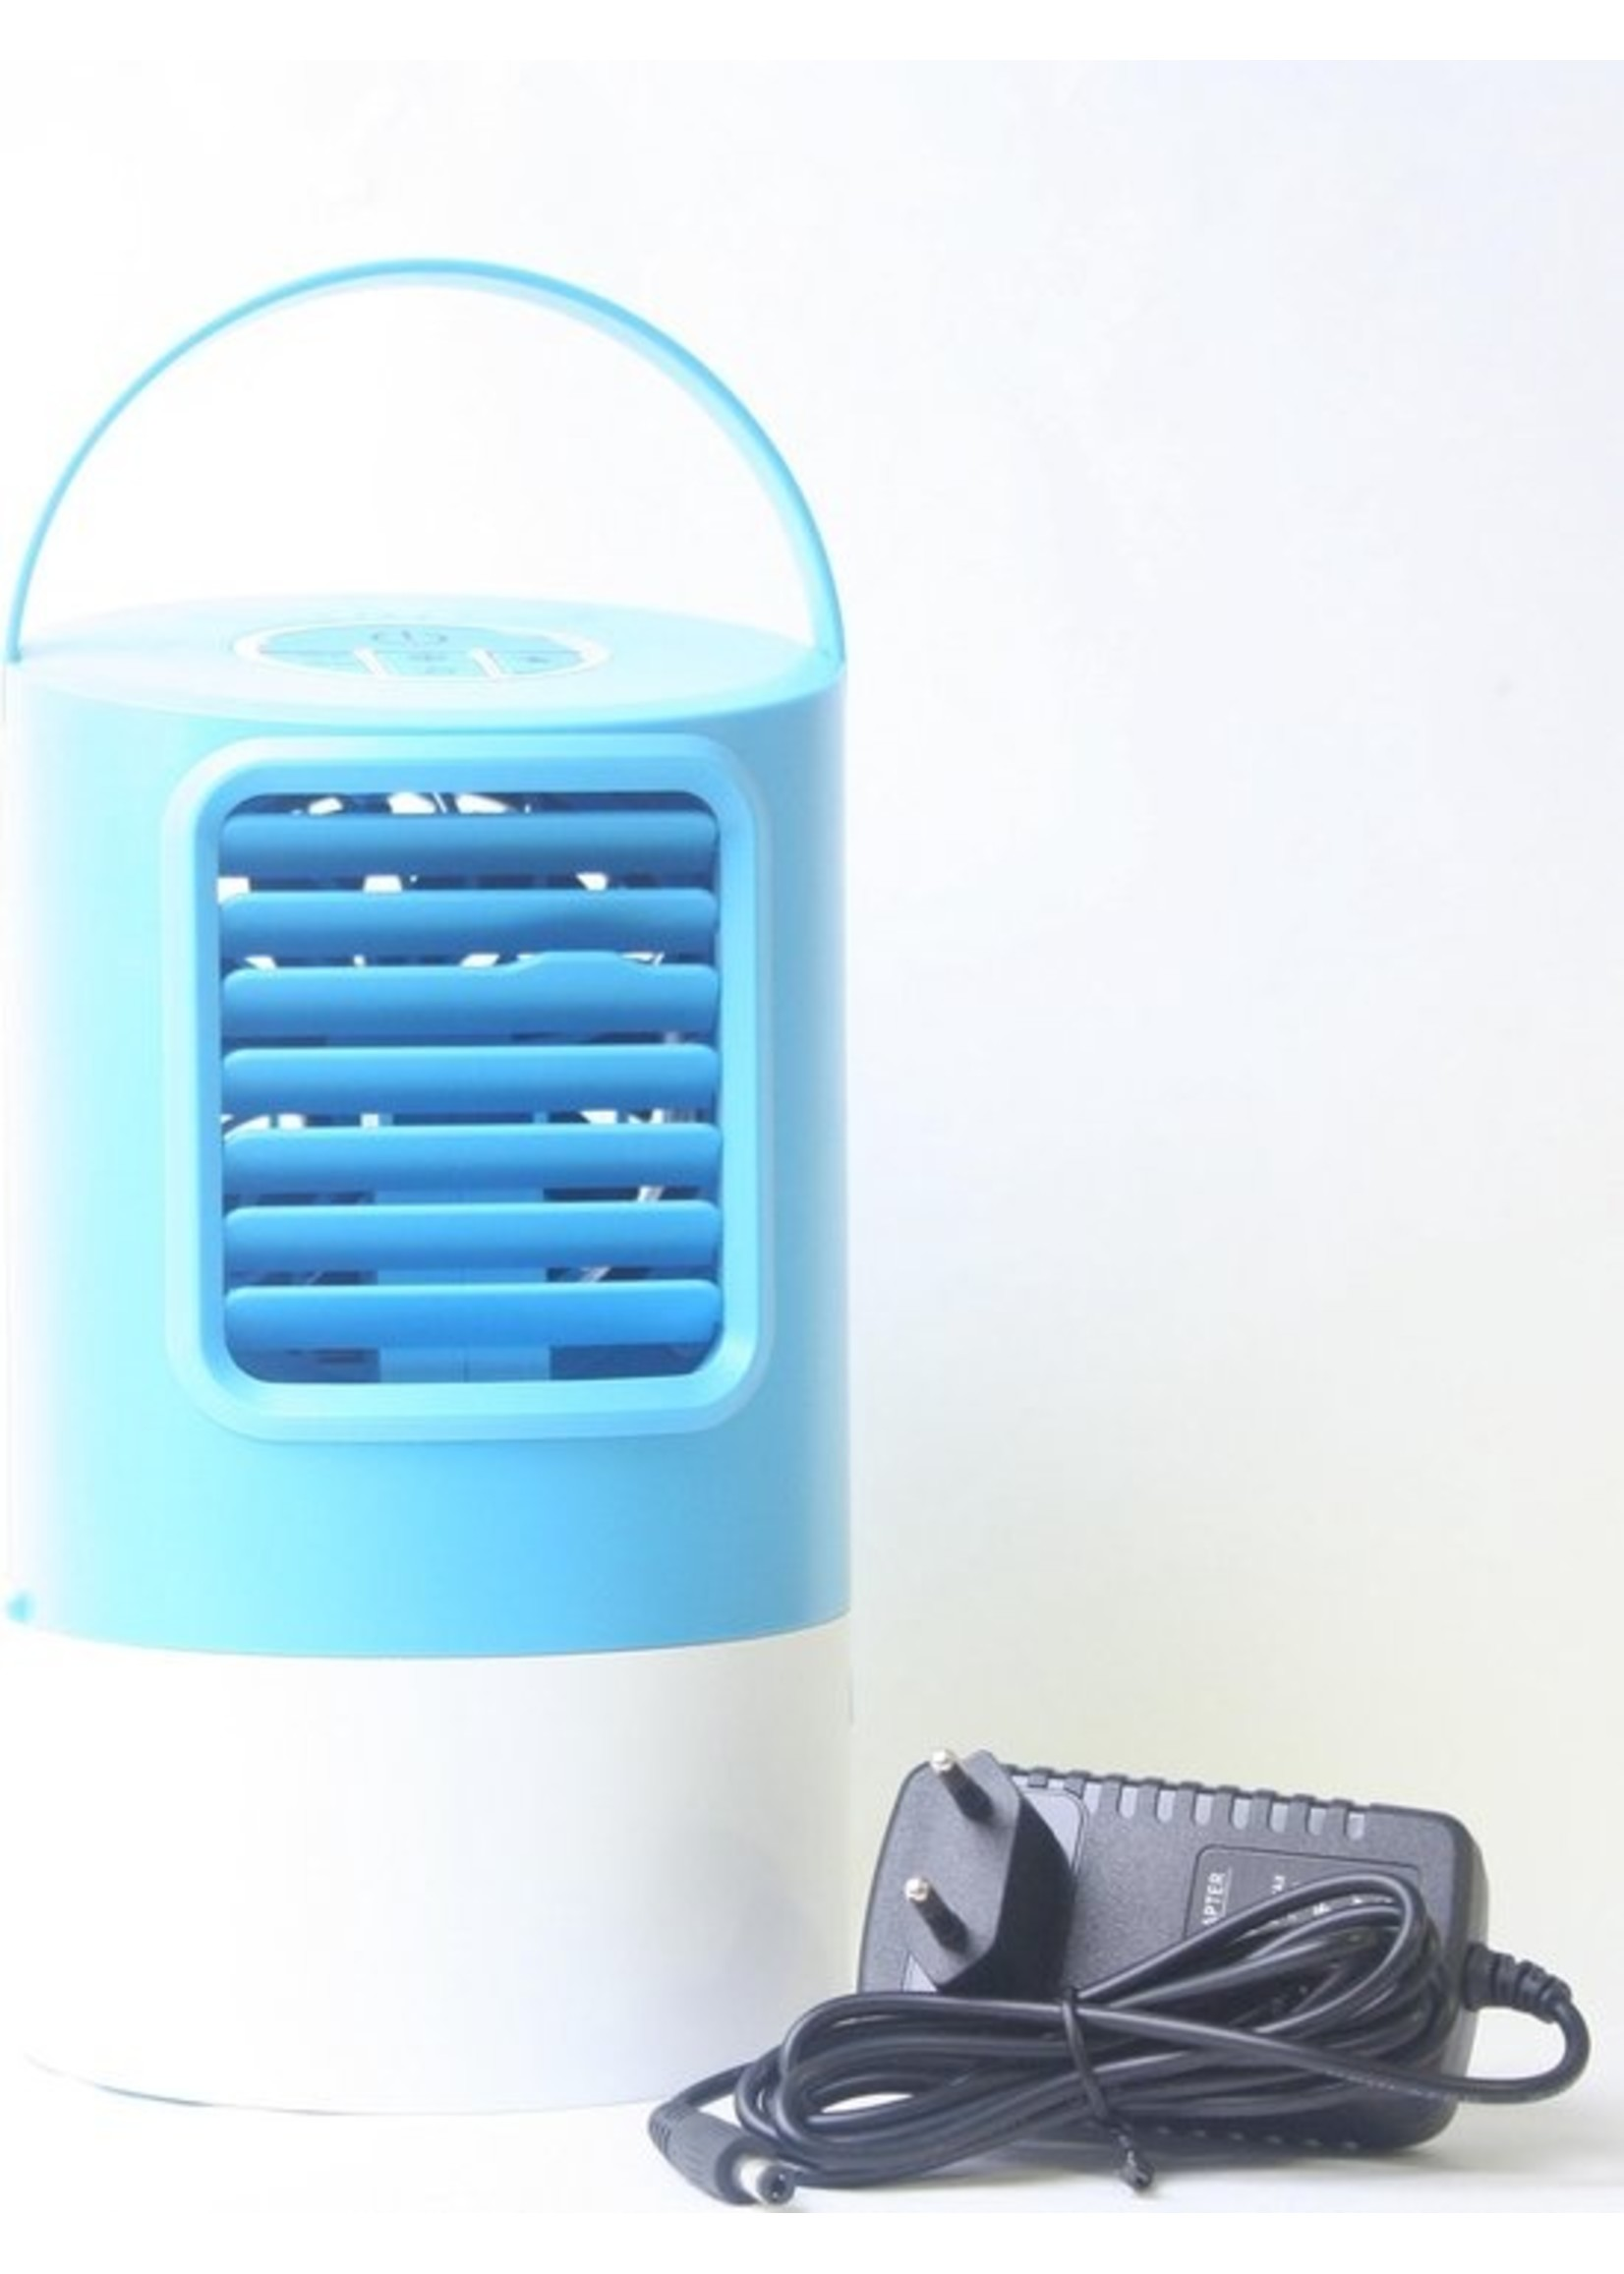 Draagbare Luchtkoeler/ventilator - blauw